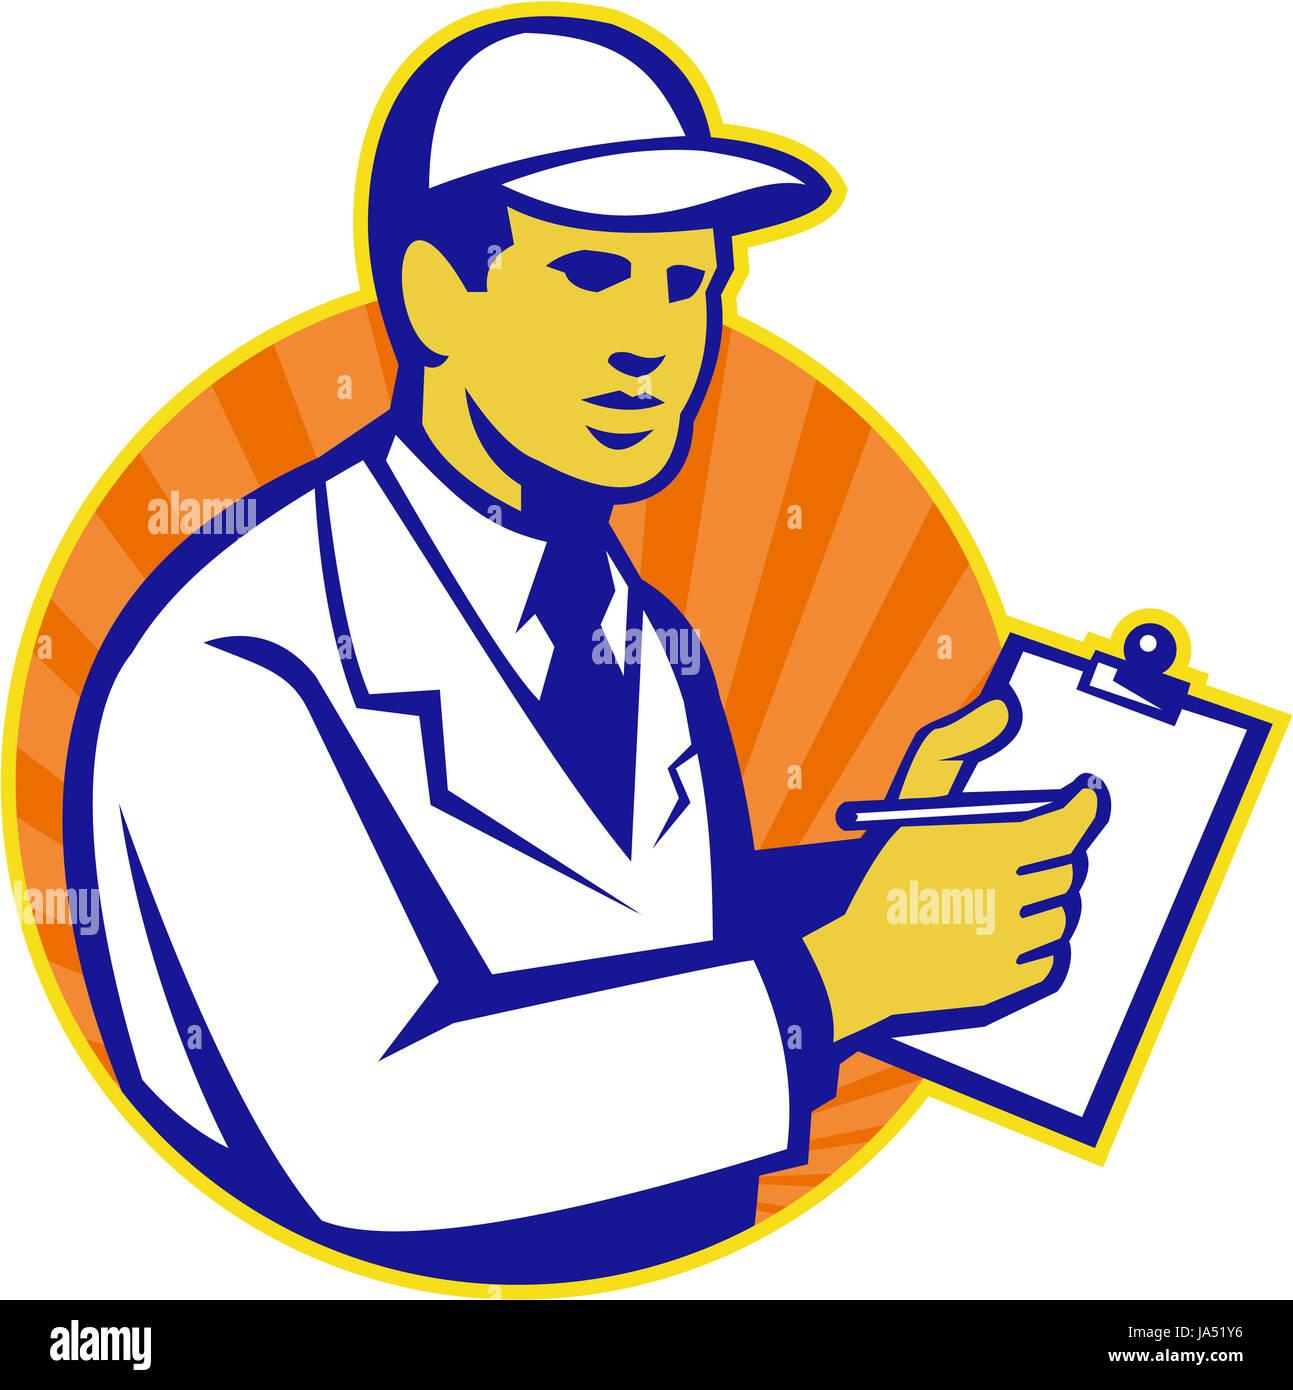 write, wrote, writing, writes, craftsman, tradesman, handicraftsman, graphics, - Stock Image